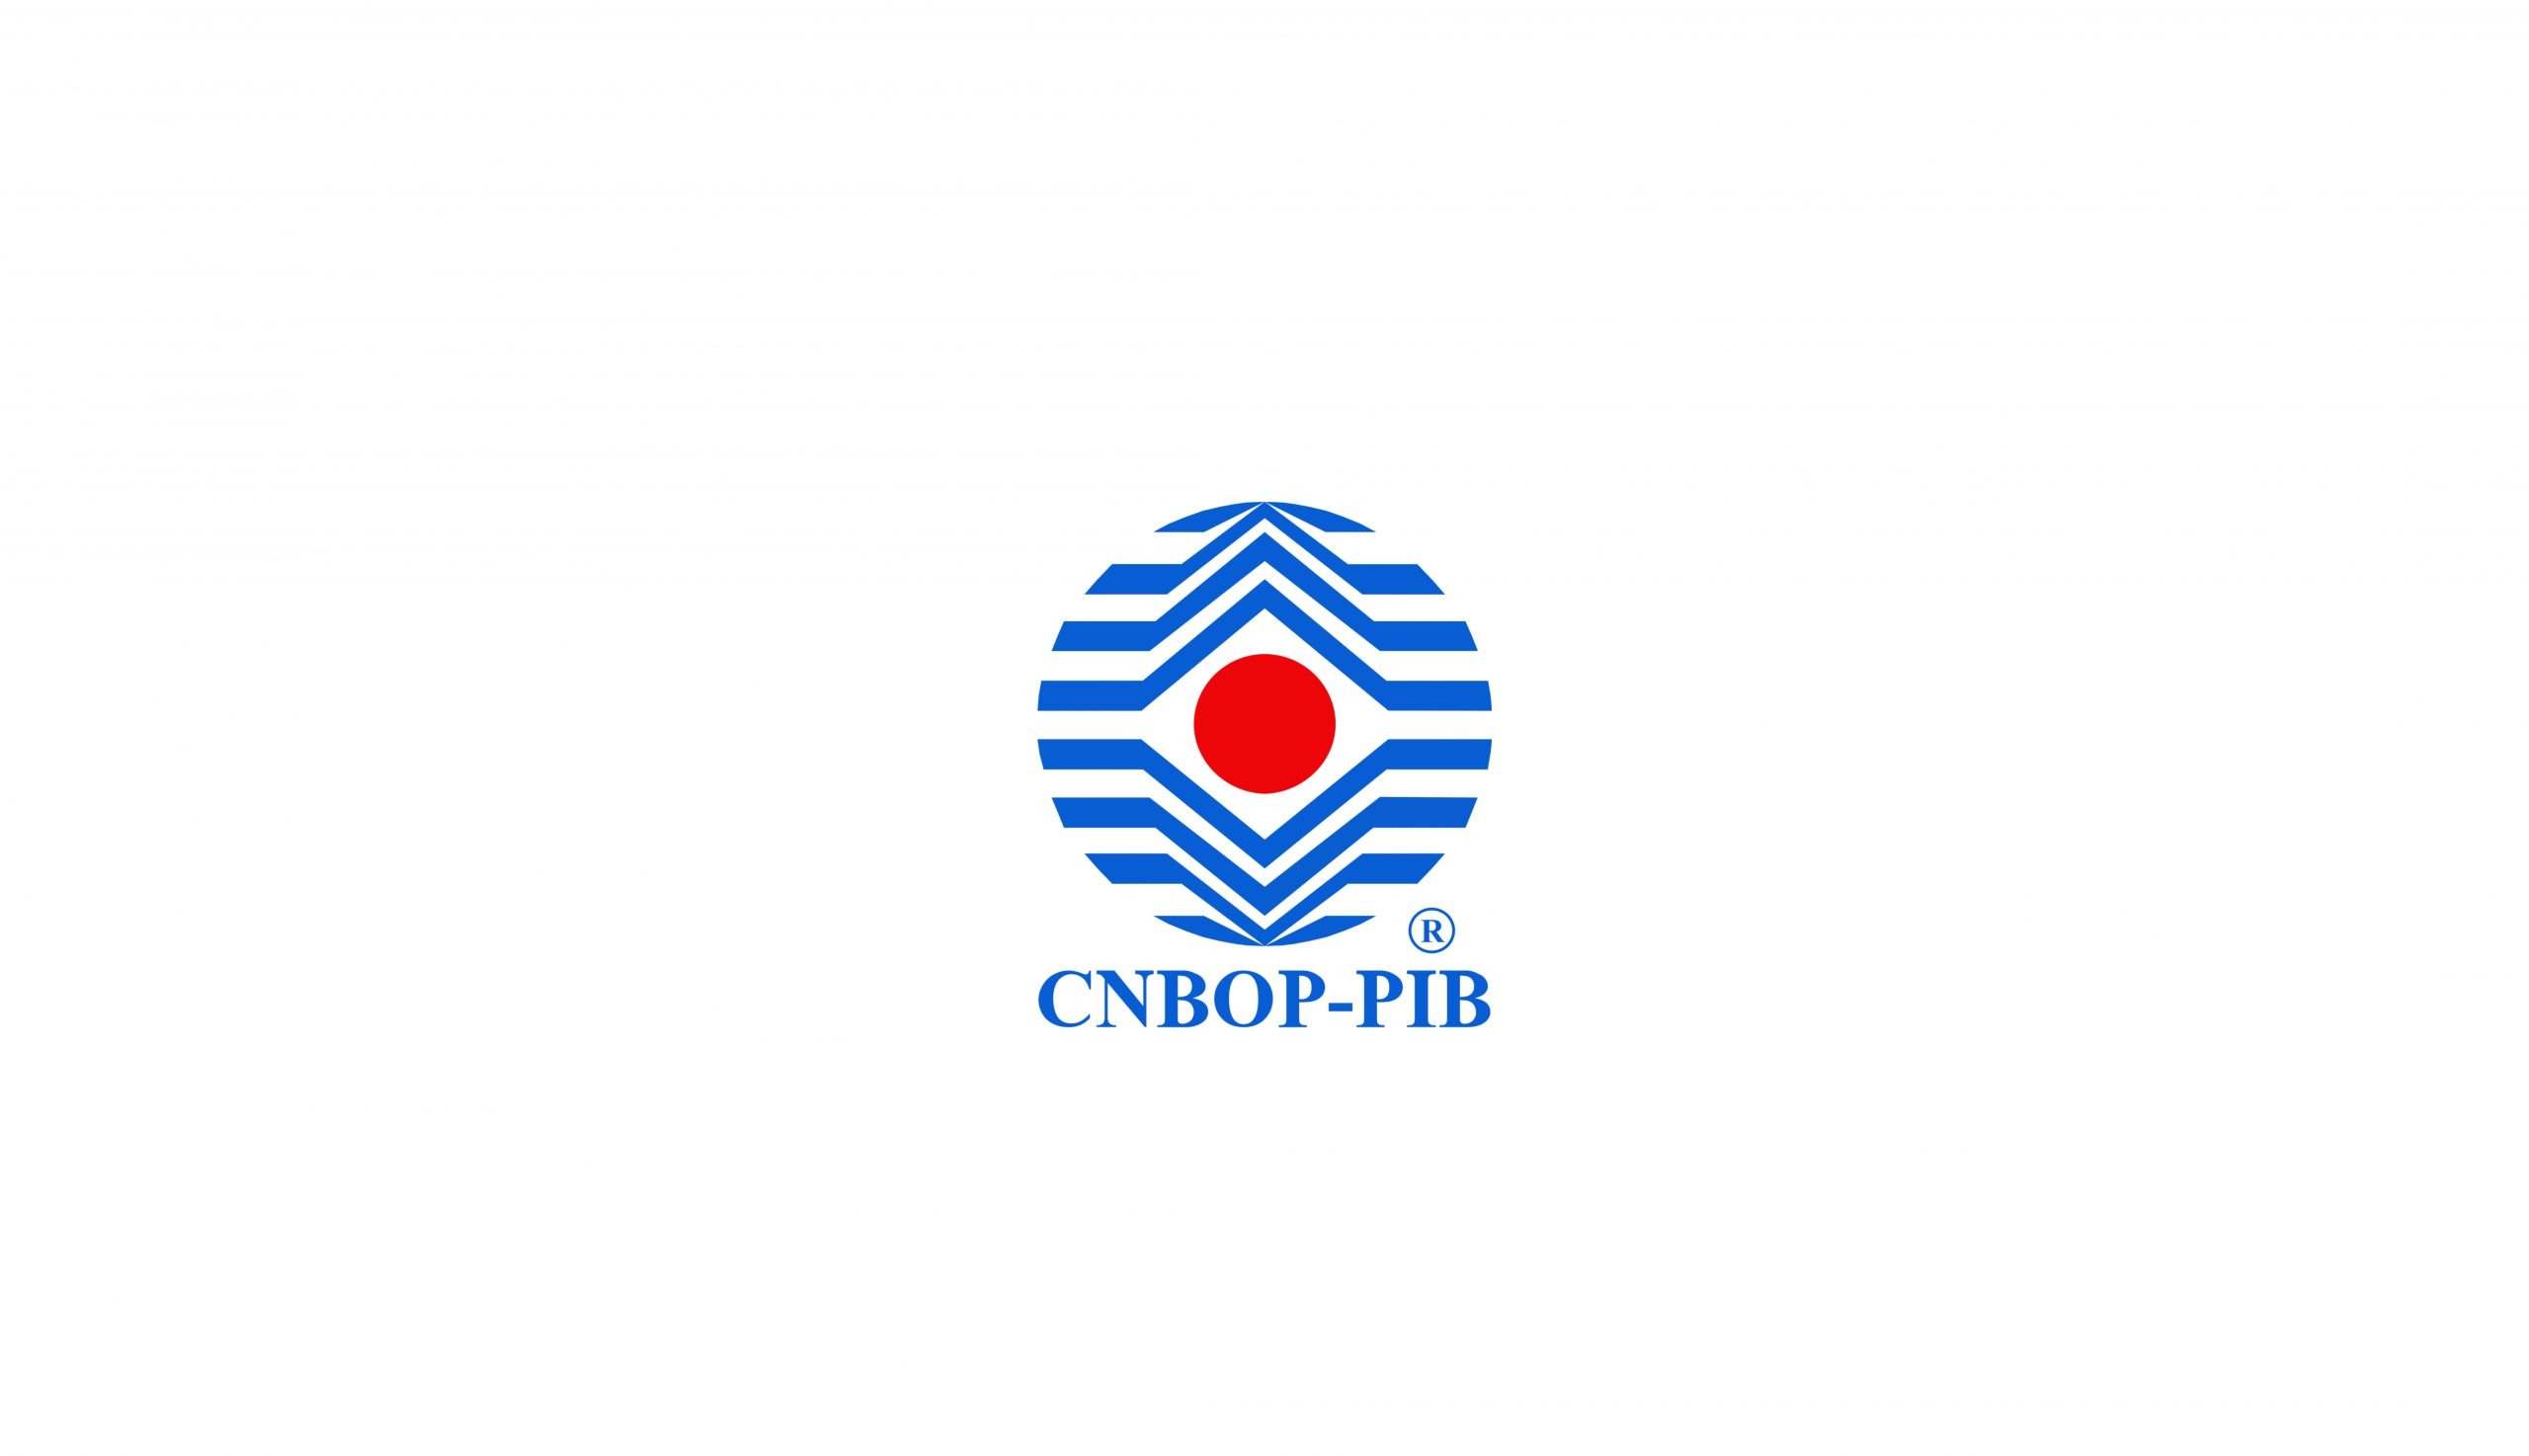 iBlockFIRE certyfikowany przez CNBOP-PIB normą PN-EN 3-7 – 06.11.2019 r.